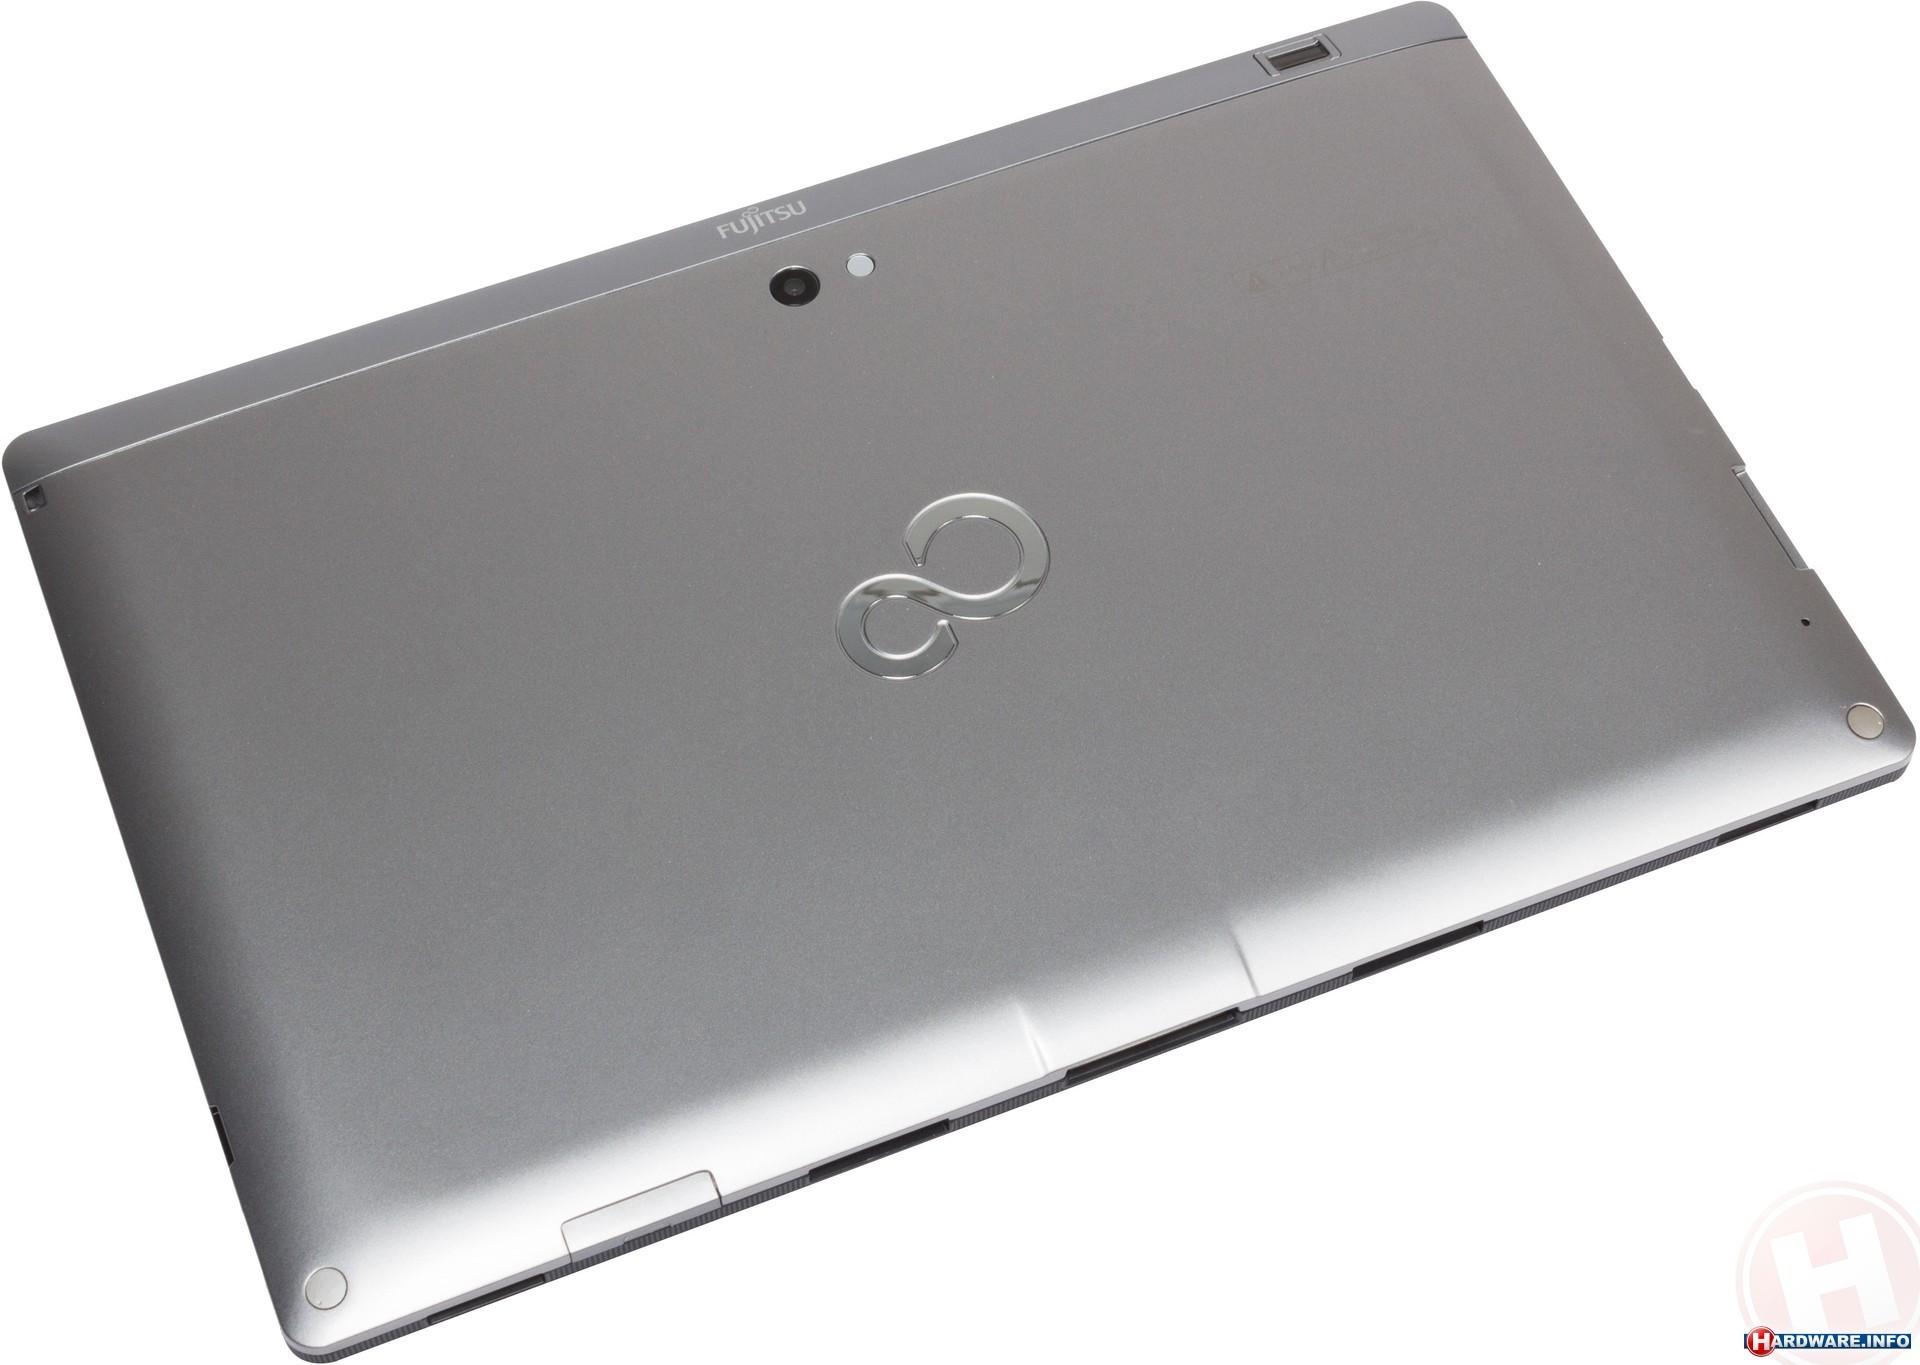 FUJITSU Stylistic Q702 tablet netbook